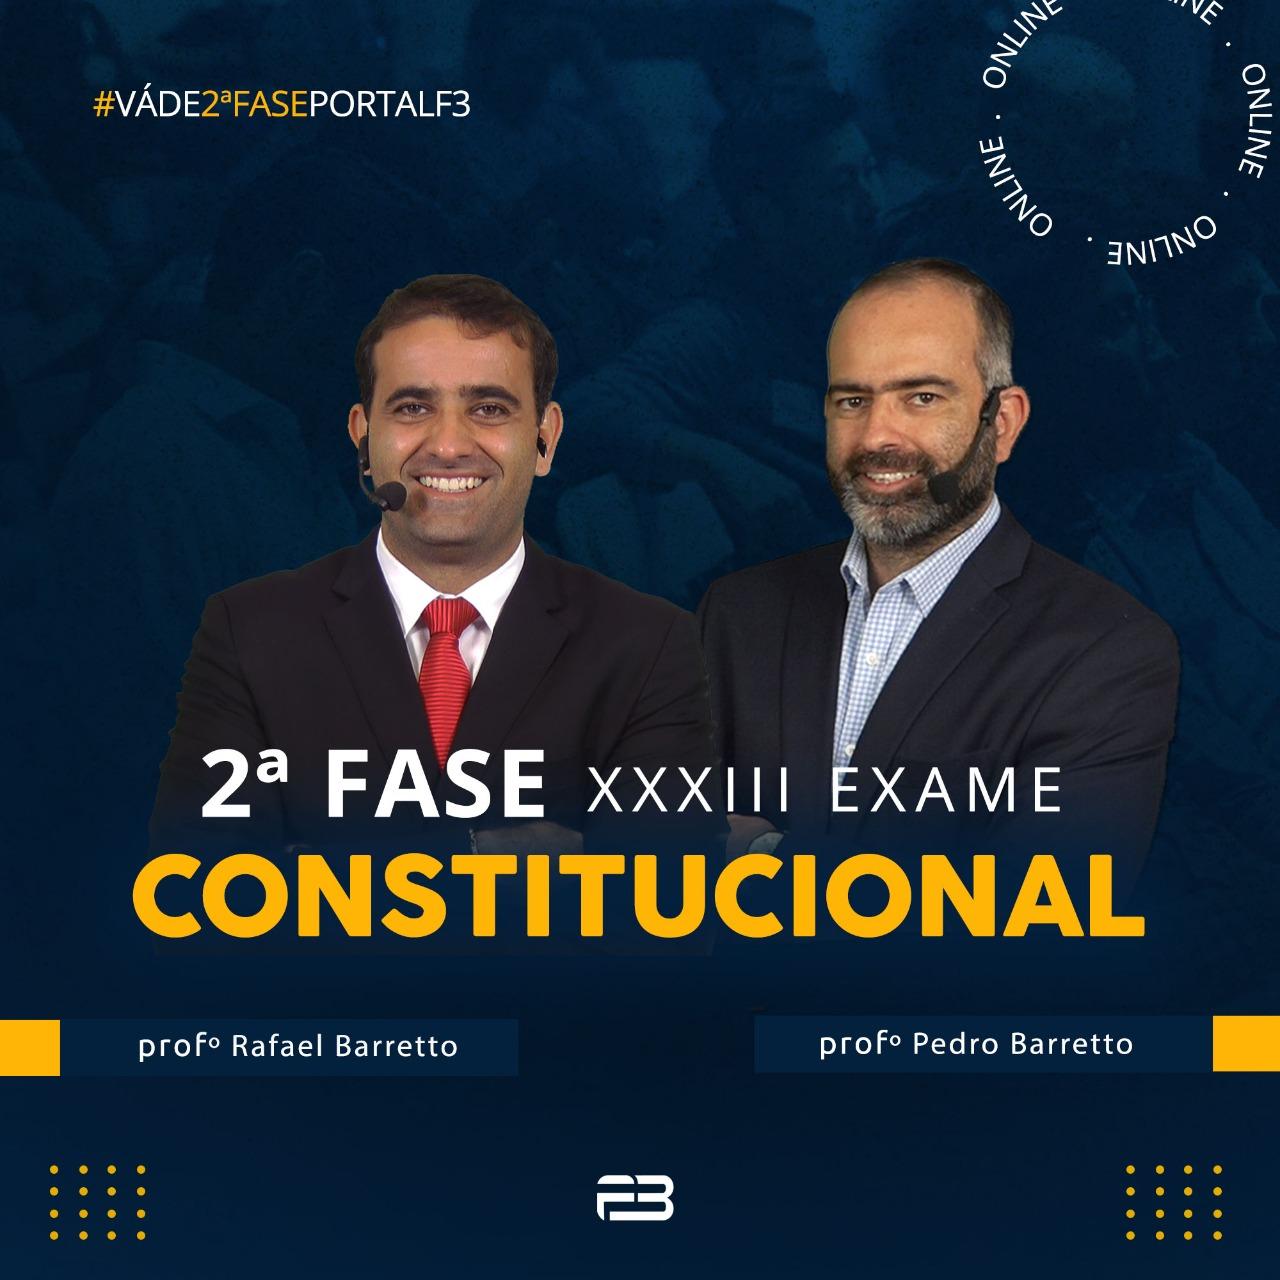 2ª FASE CONSTITUCIONAL - XXXIII EXAME ONLINE